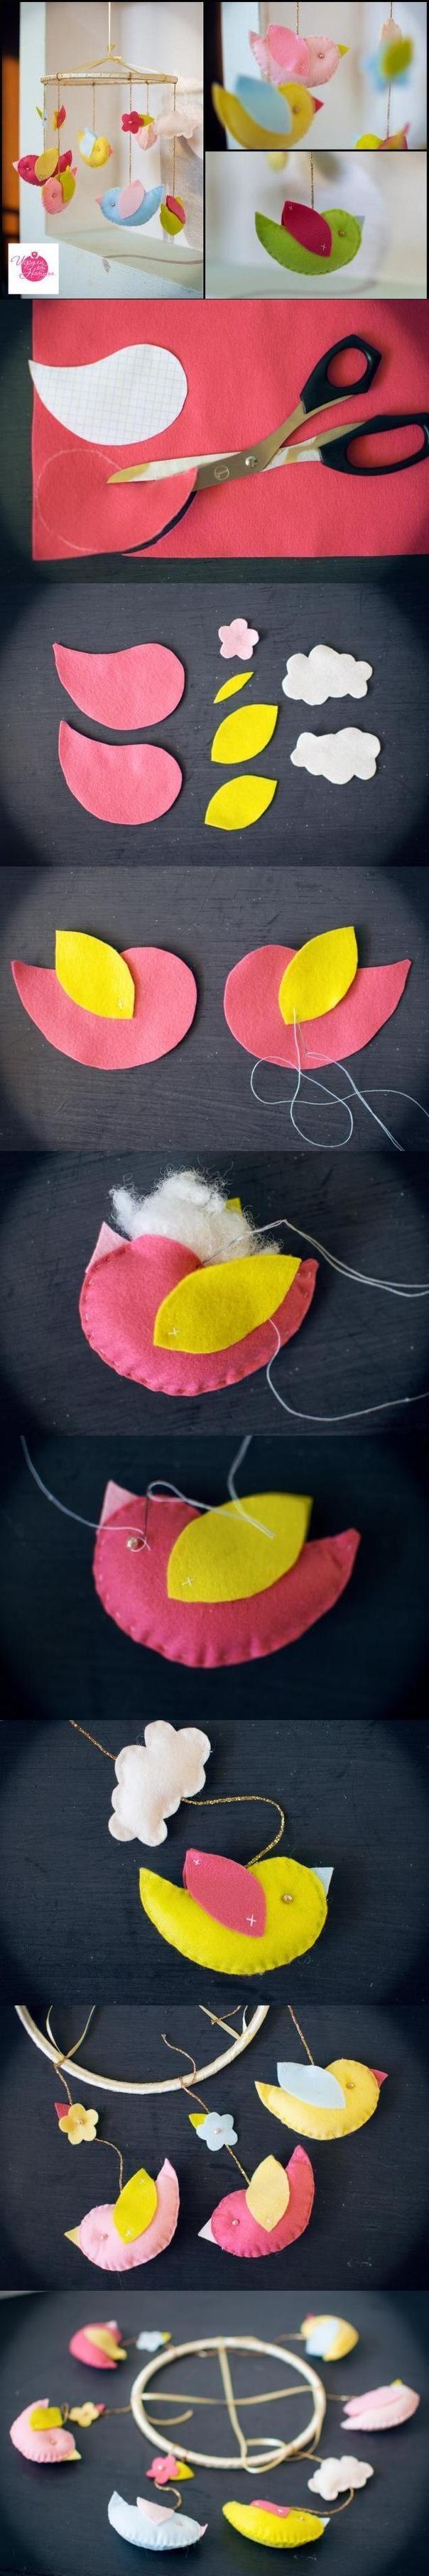 DIY Fabric Bird Mobile